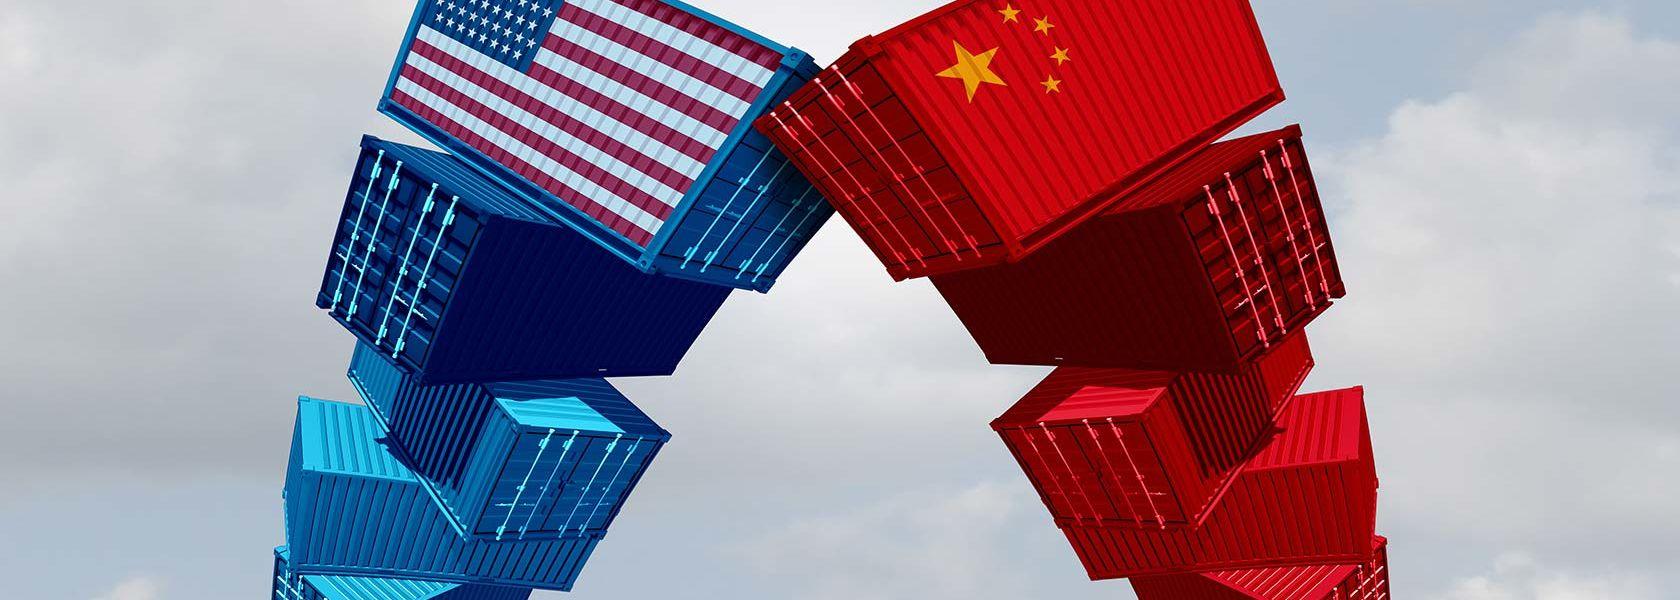 Rare earth crisis looms following China's export clamp-down